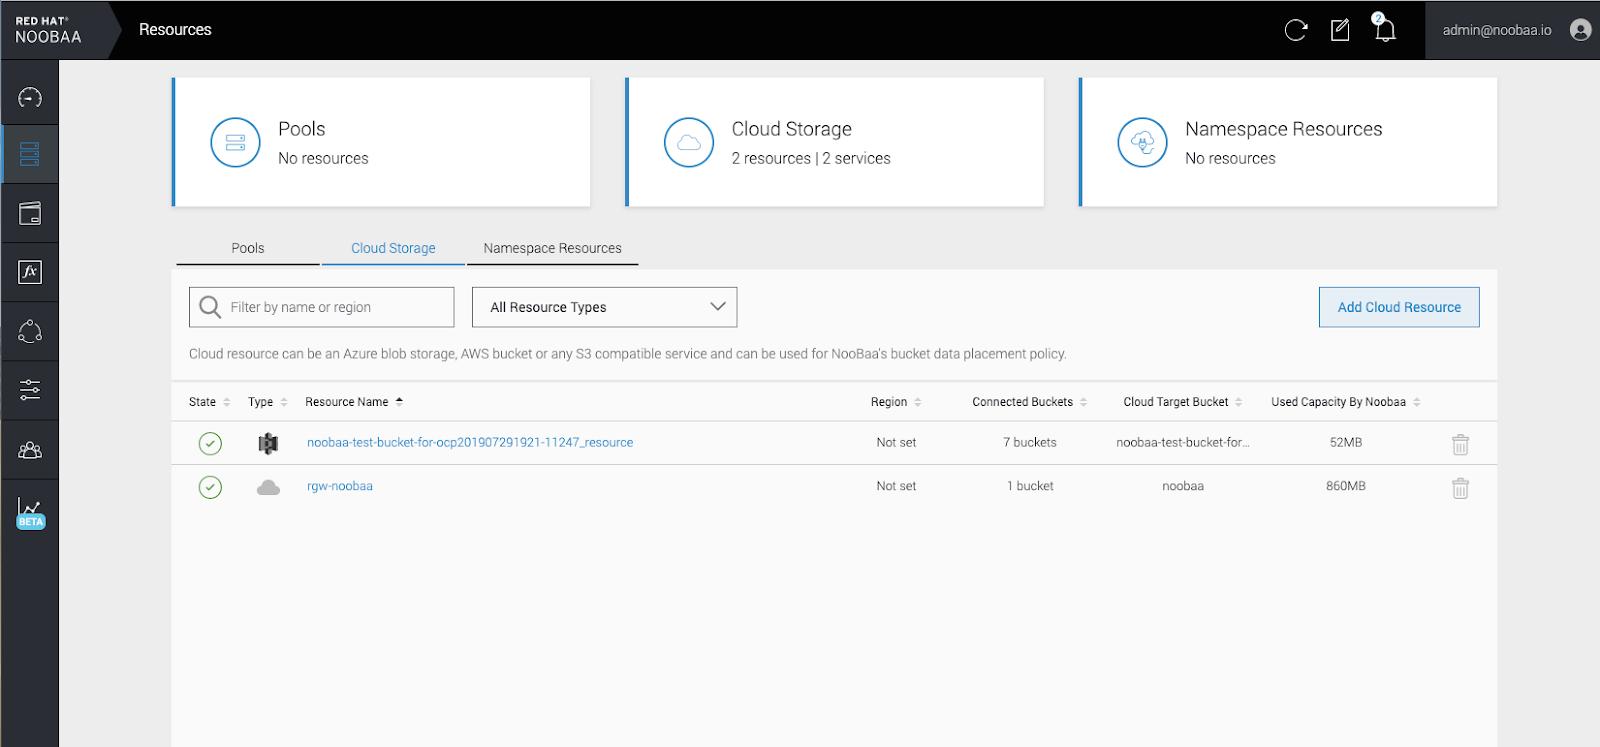 MCG add cloud resource